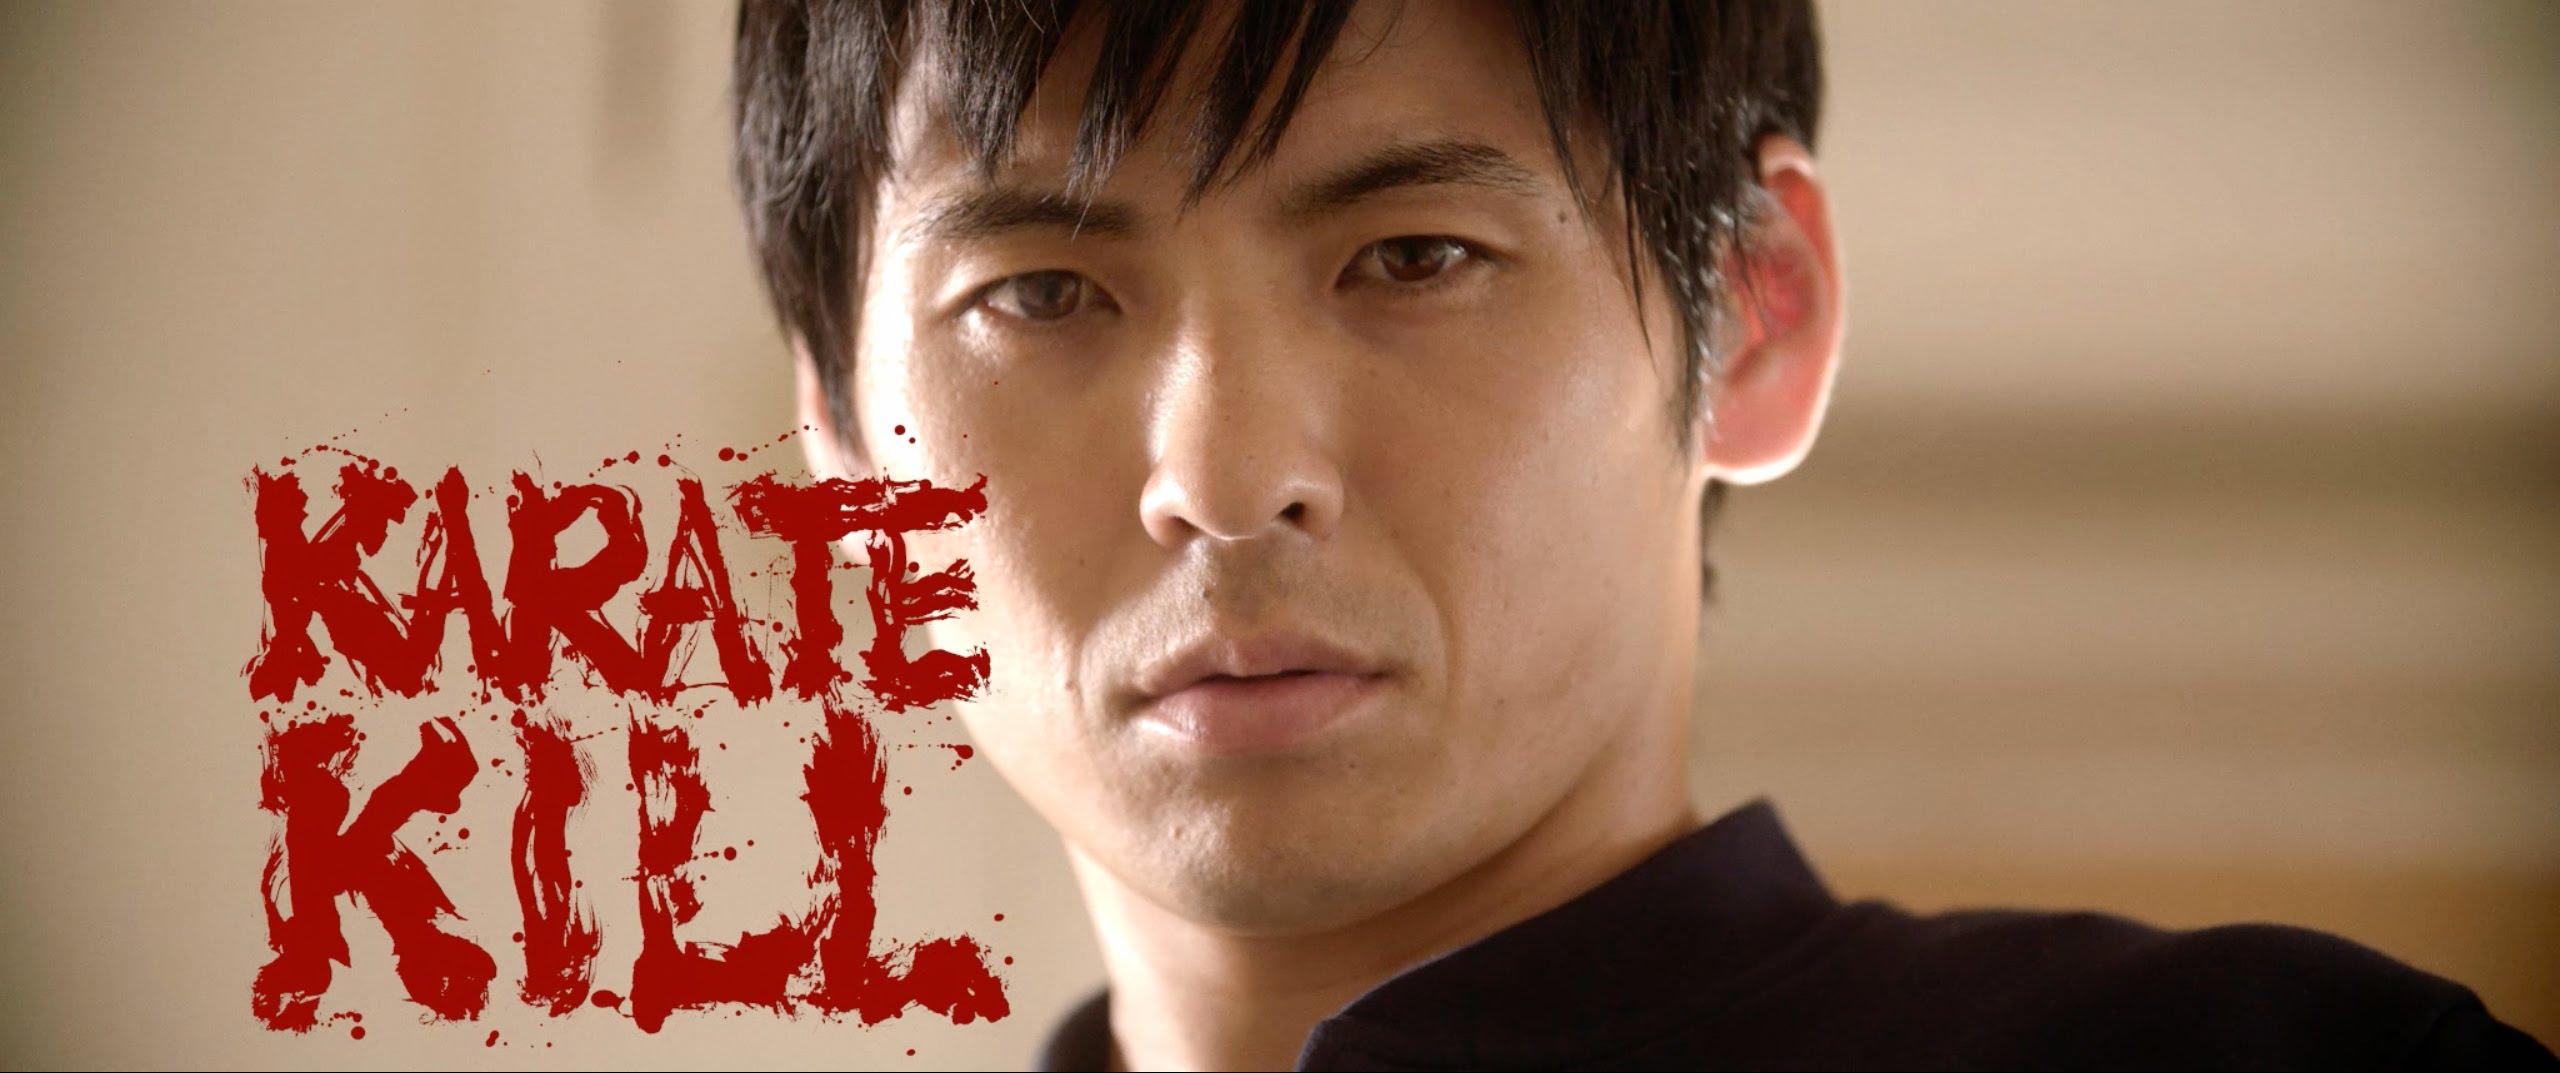 KARATE KILL teaser trailer